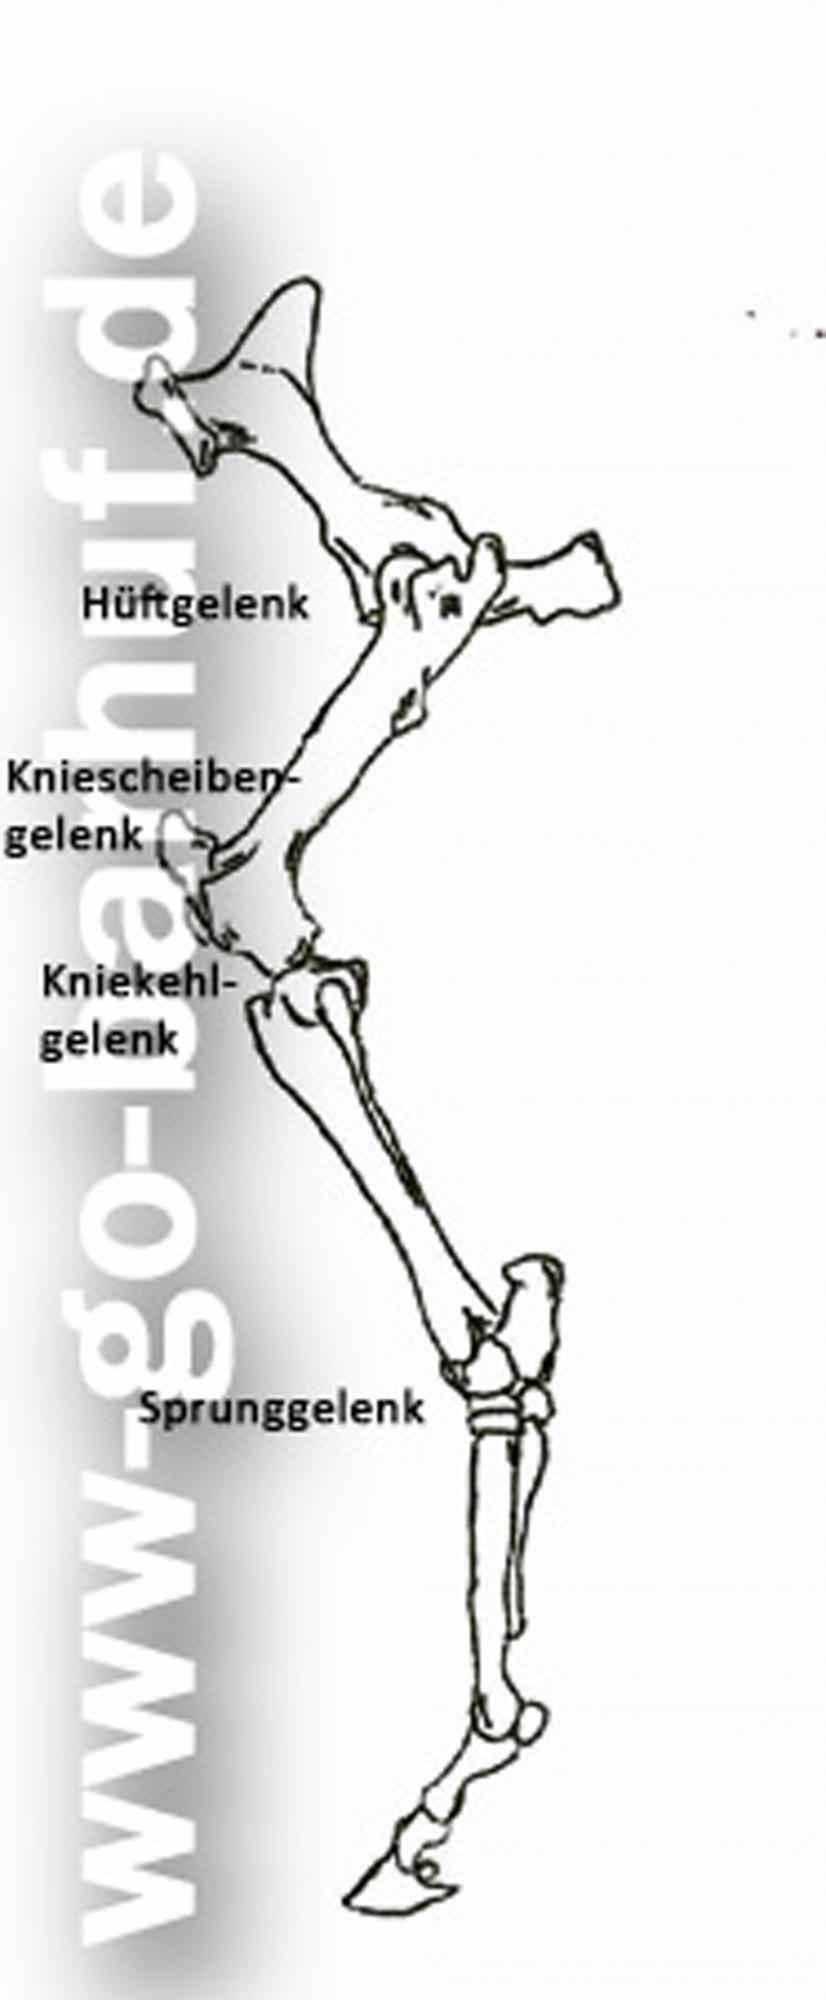 Manu Volk Go-barhuf.de - Hintergliedmaße